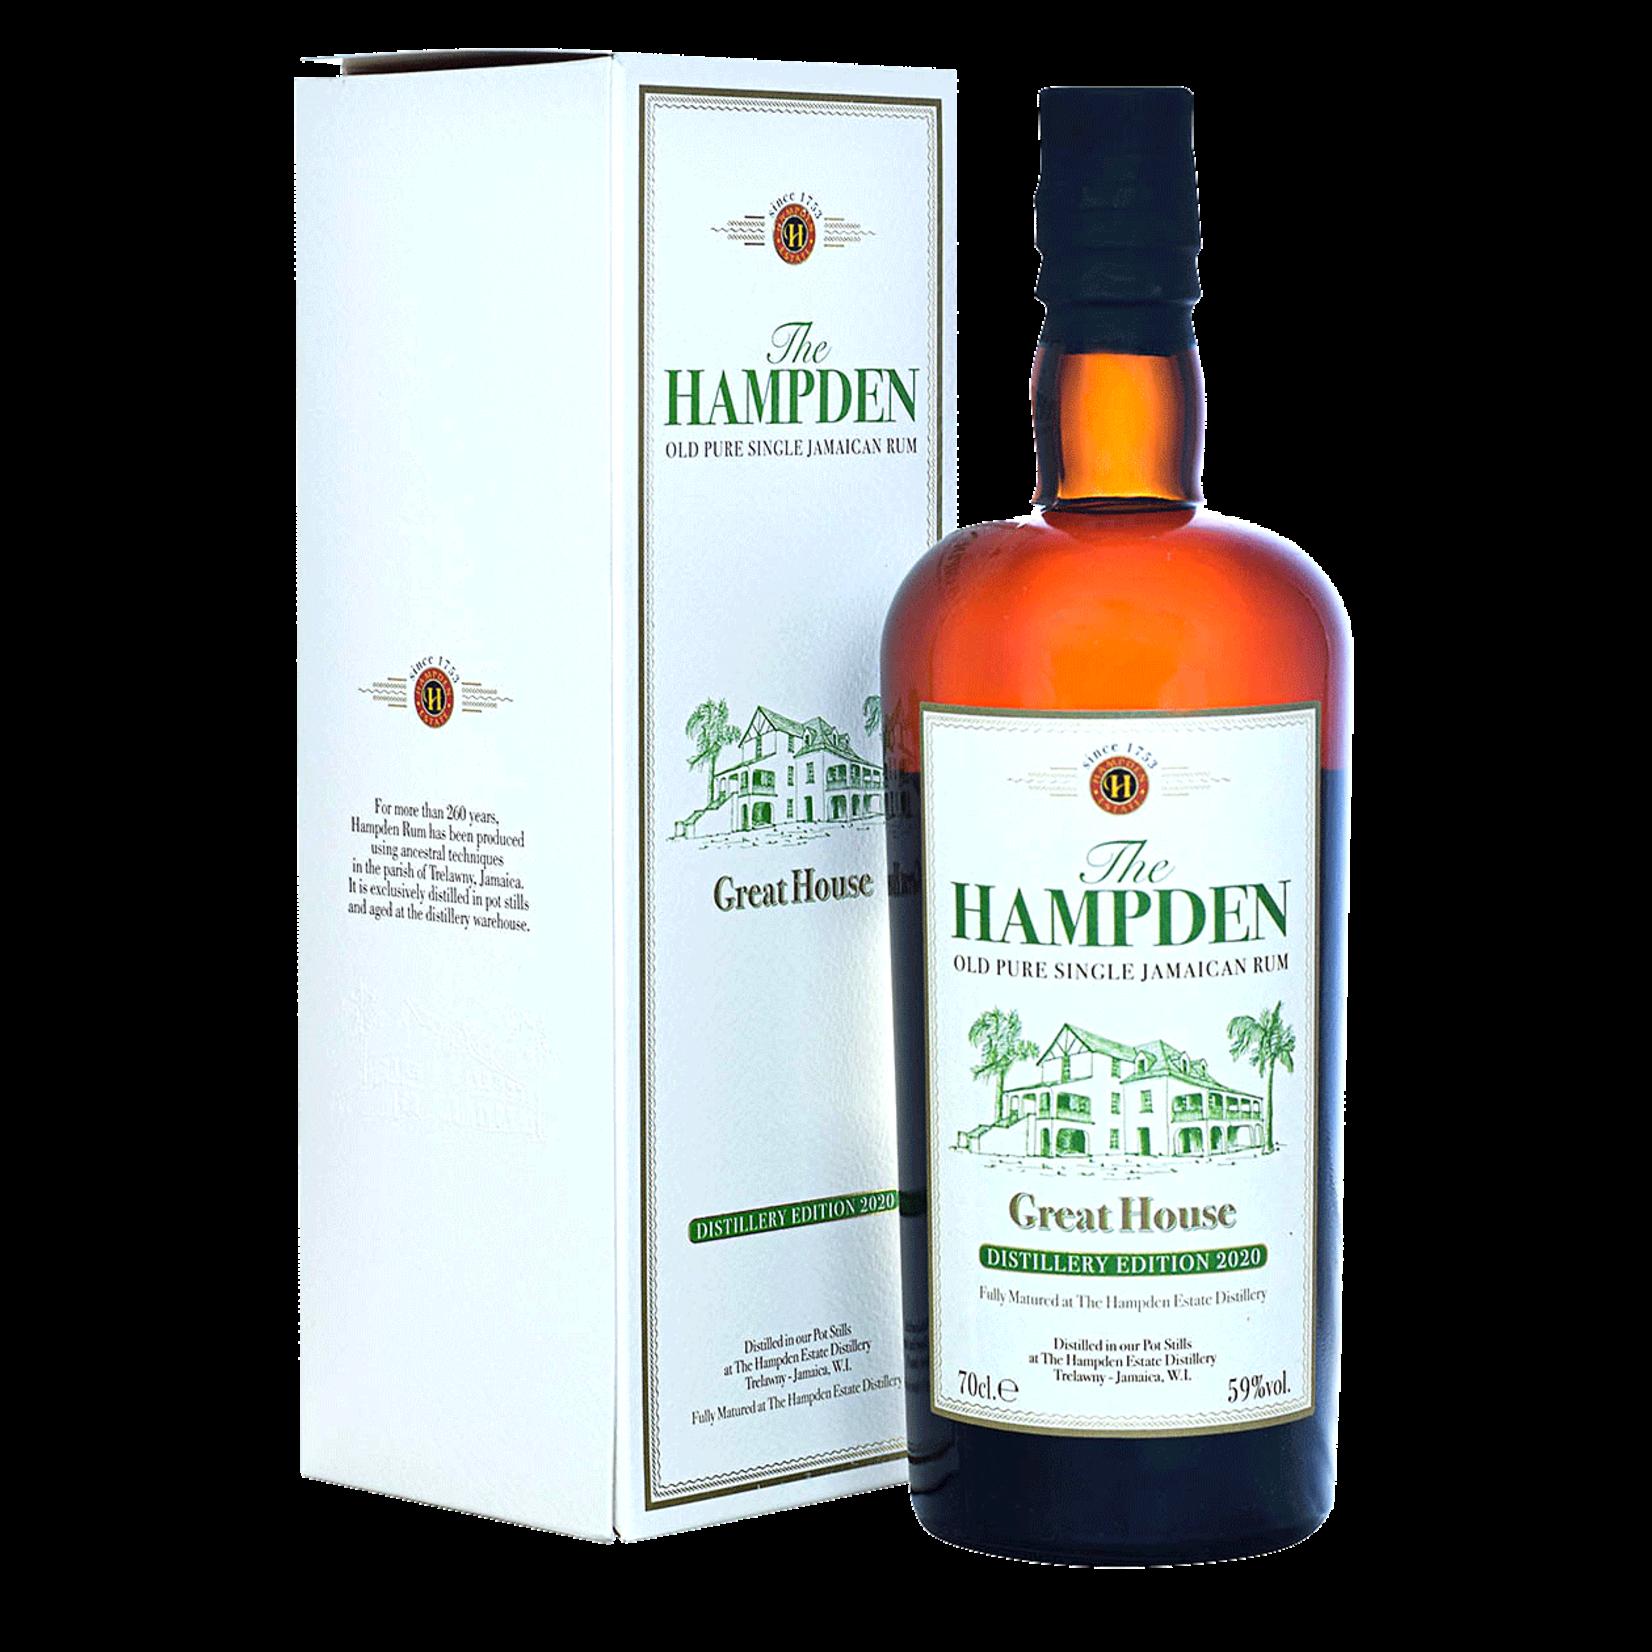 Spirits Hampden Estate Great House Old Pure Single Jamaican Rum Distillery Edition 2020